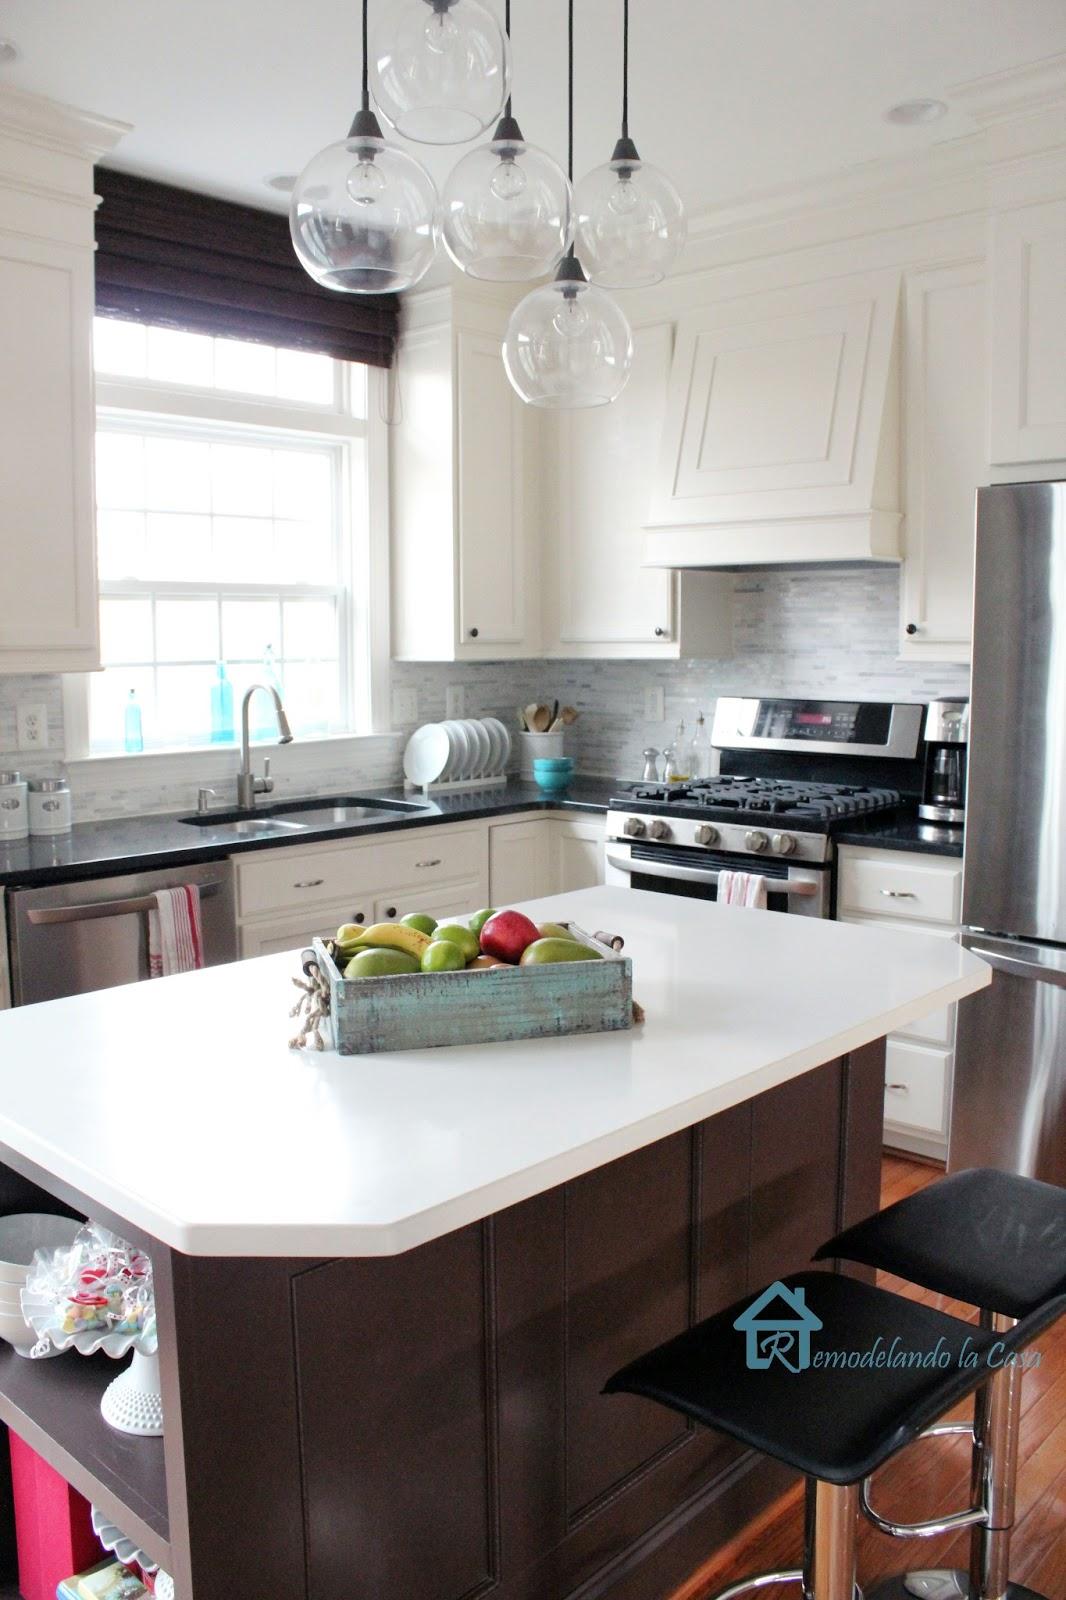 Diy Home Design Ideas Com: 15 DIY Home Improvement Projects